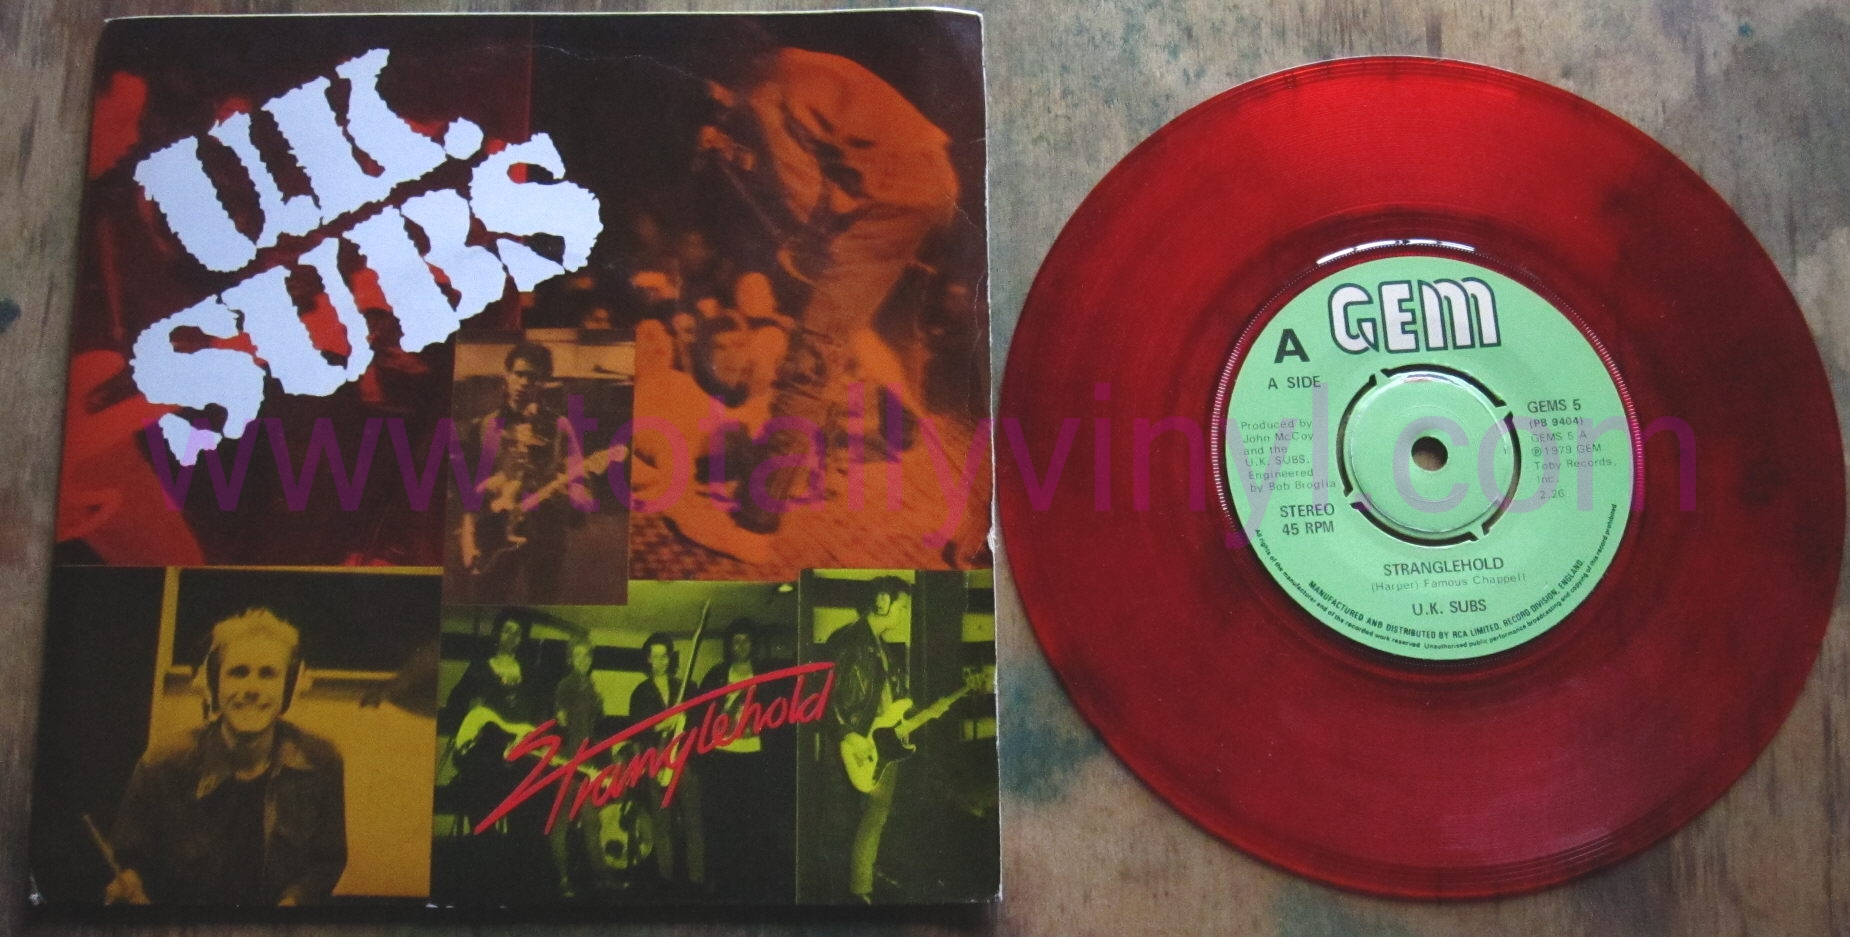 Totally Vinyl Records U K Subs Stranglehold 7 Inch